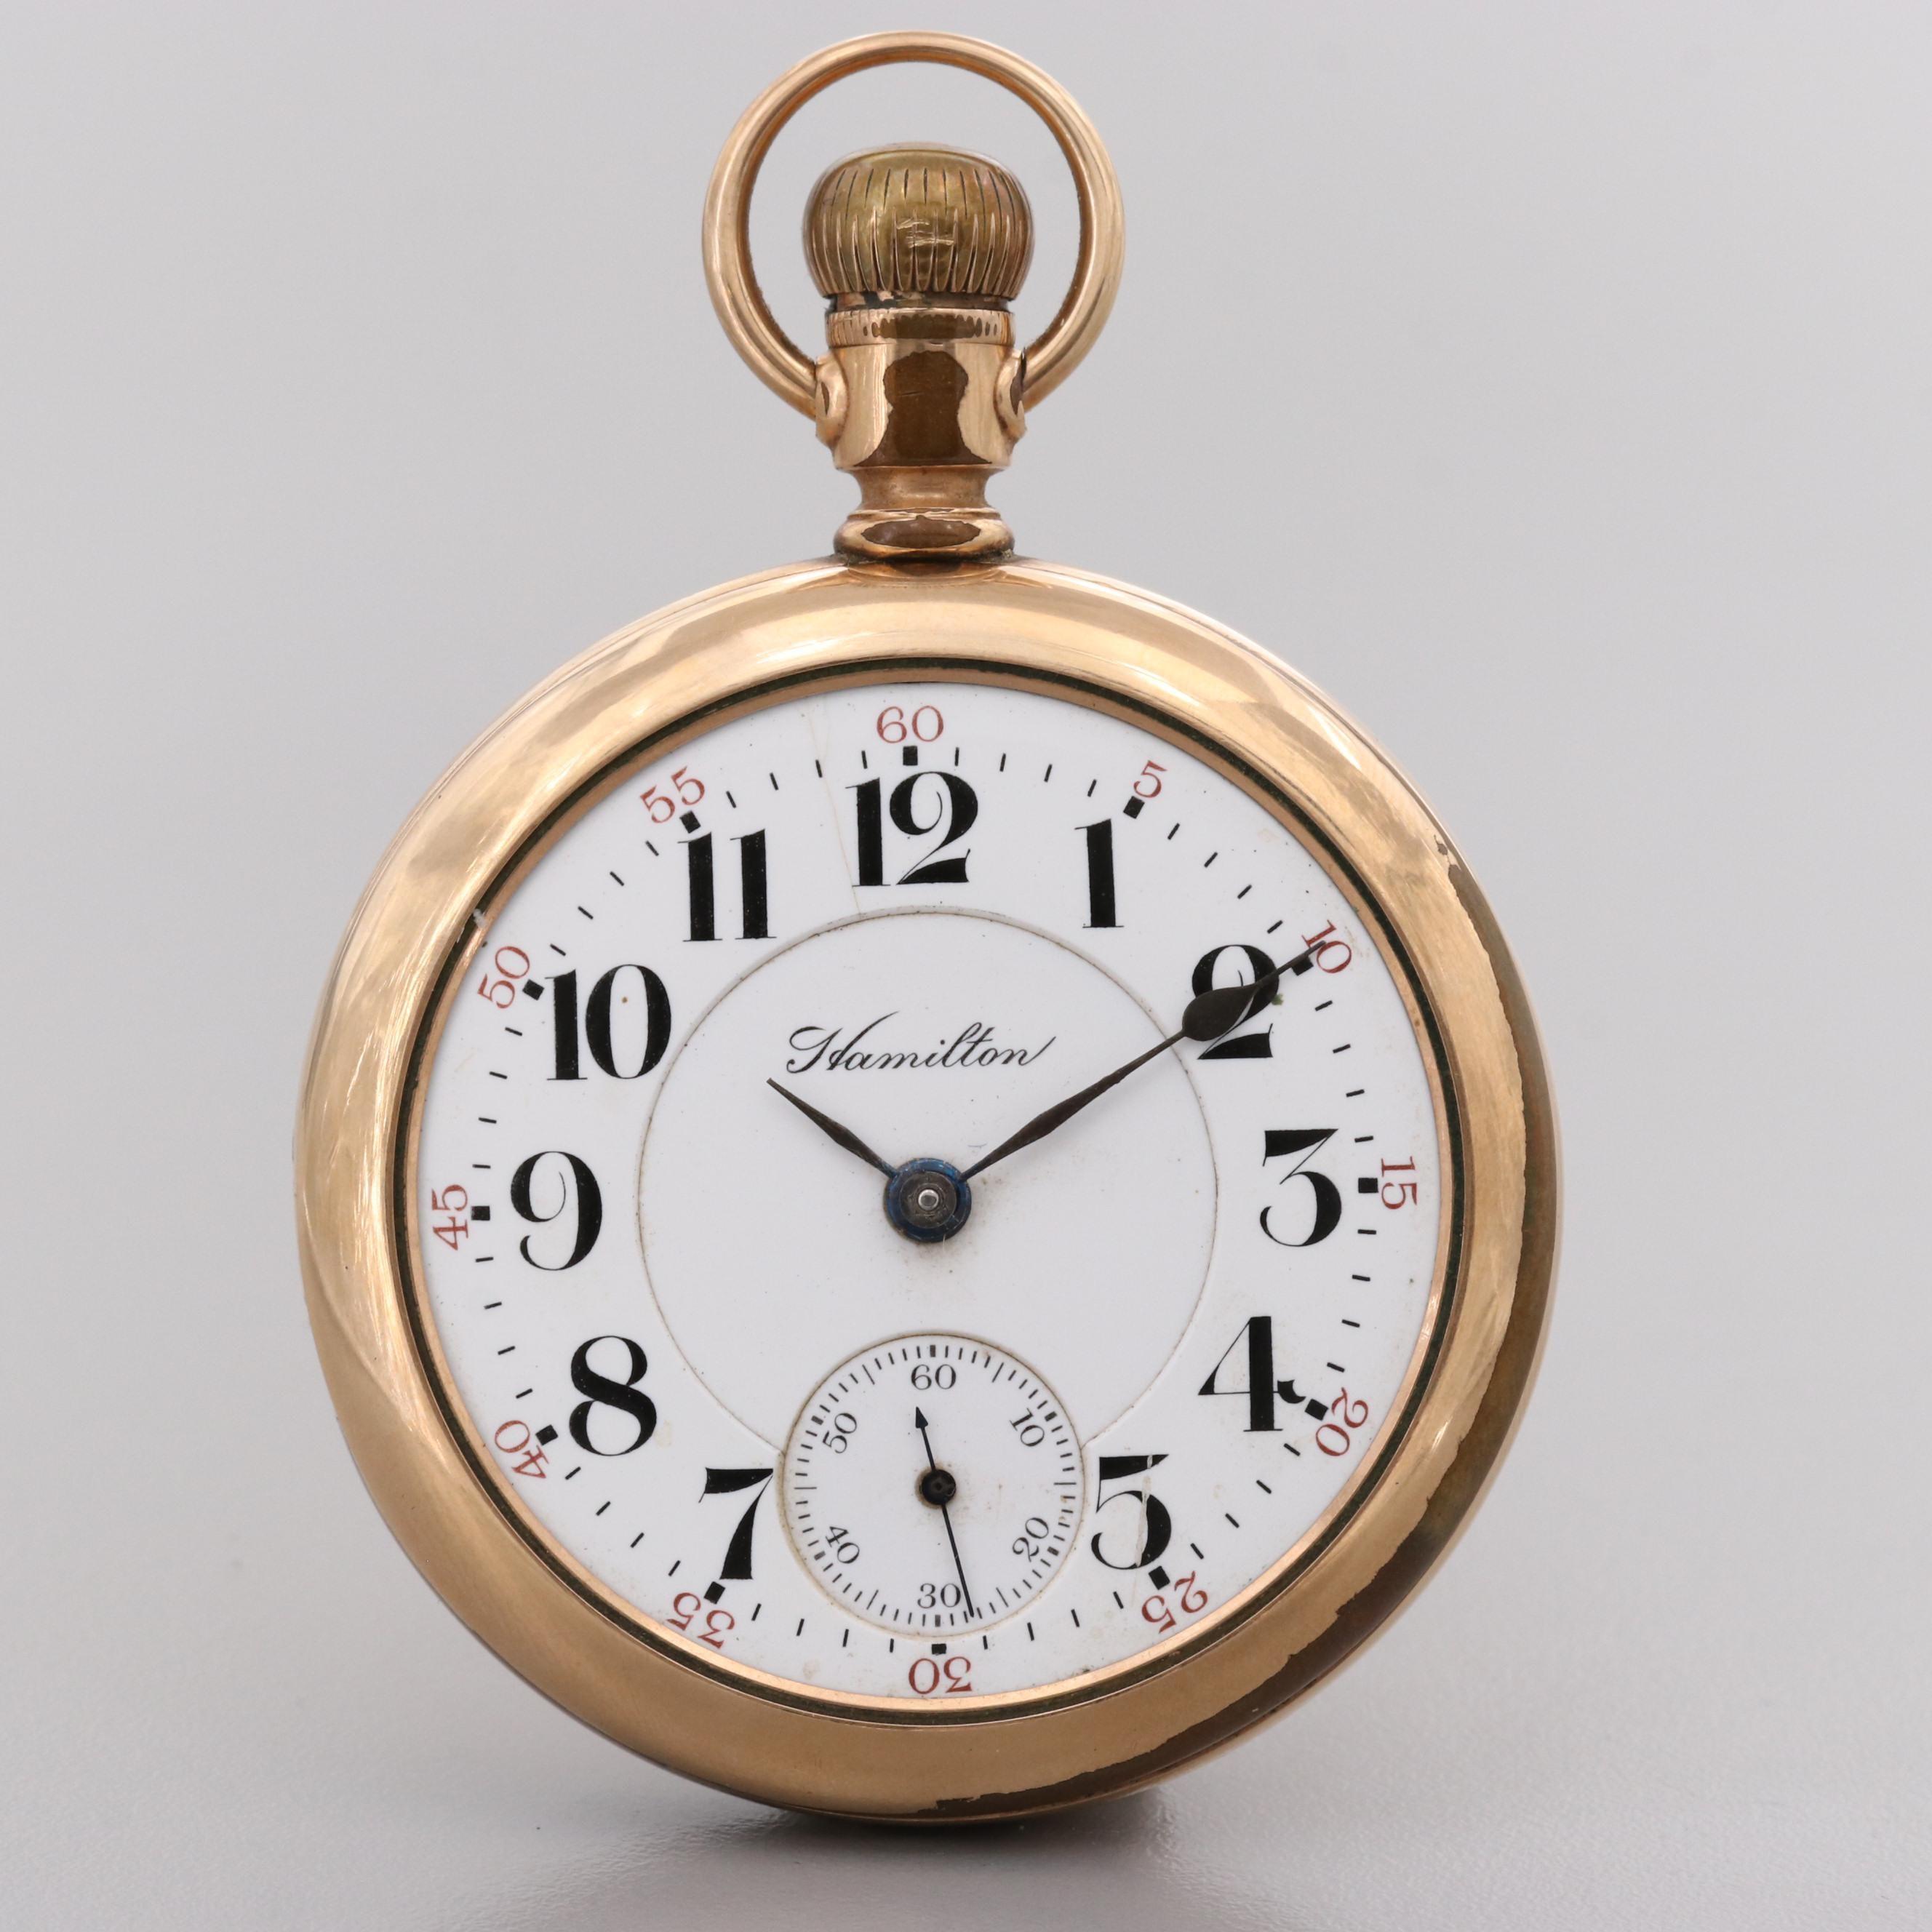 Hamilton Gold Filled Pocket Watch, 1912